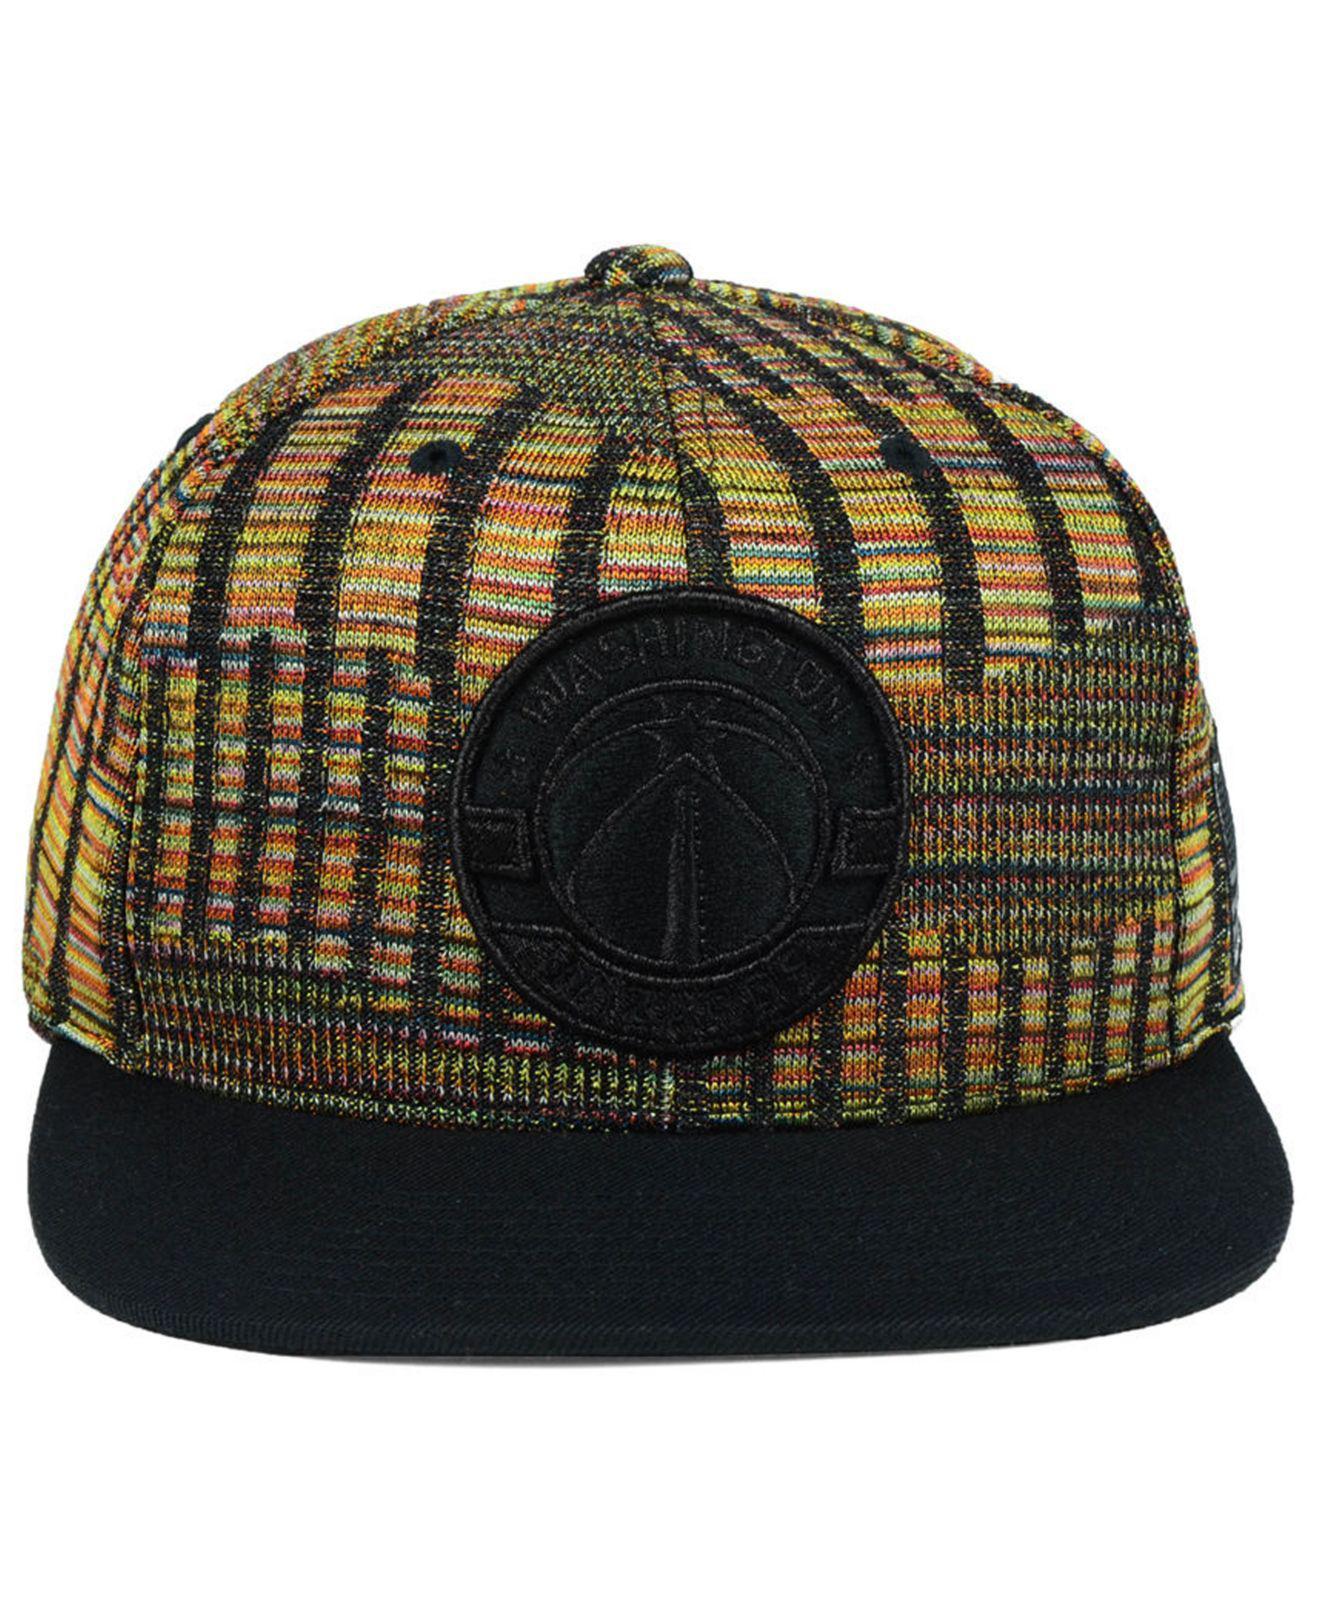 277804d2e7de33 ... italy lyst mitchell ness washington wizards black flag snapback cap in  black for men 15ce8 1bc81